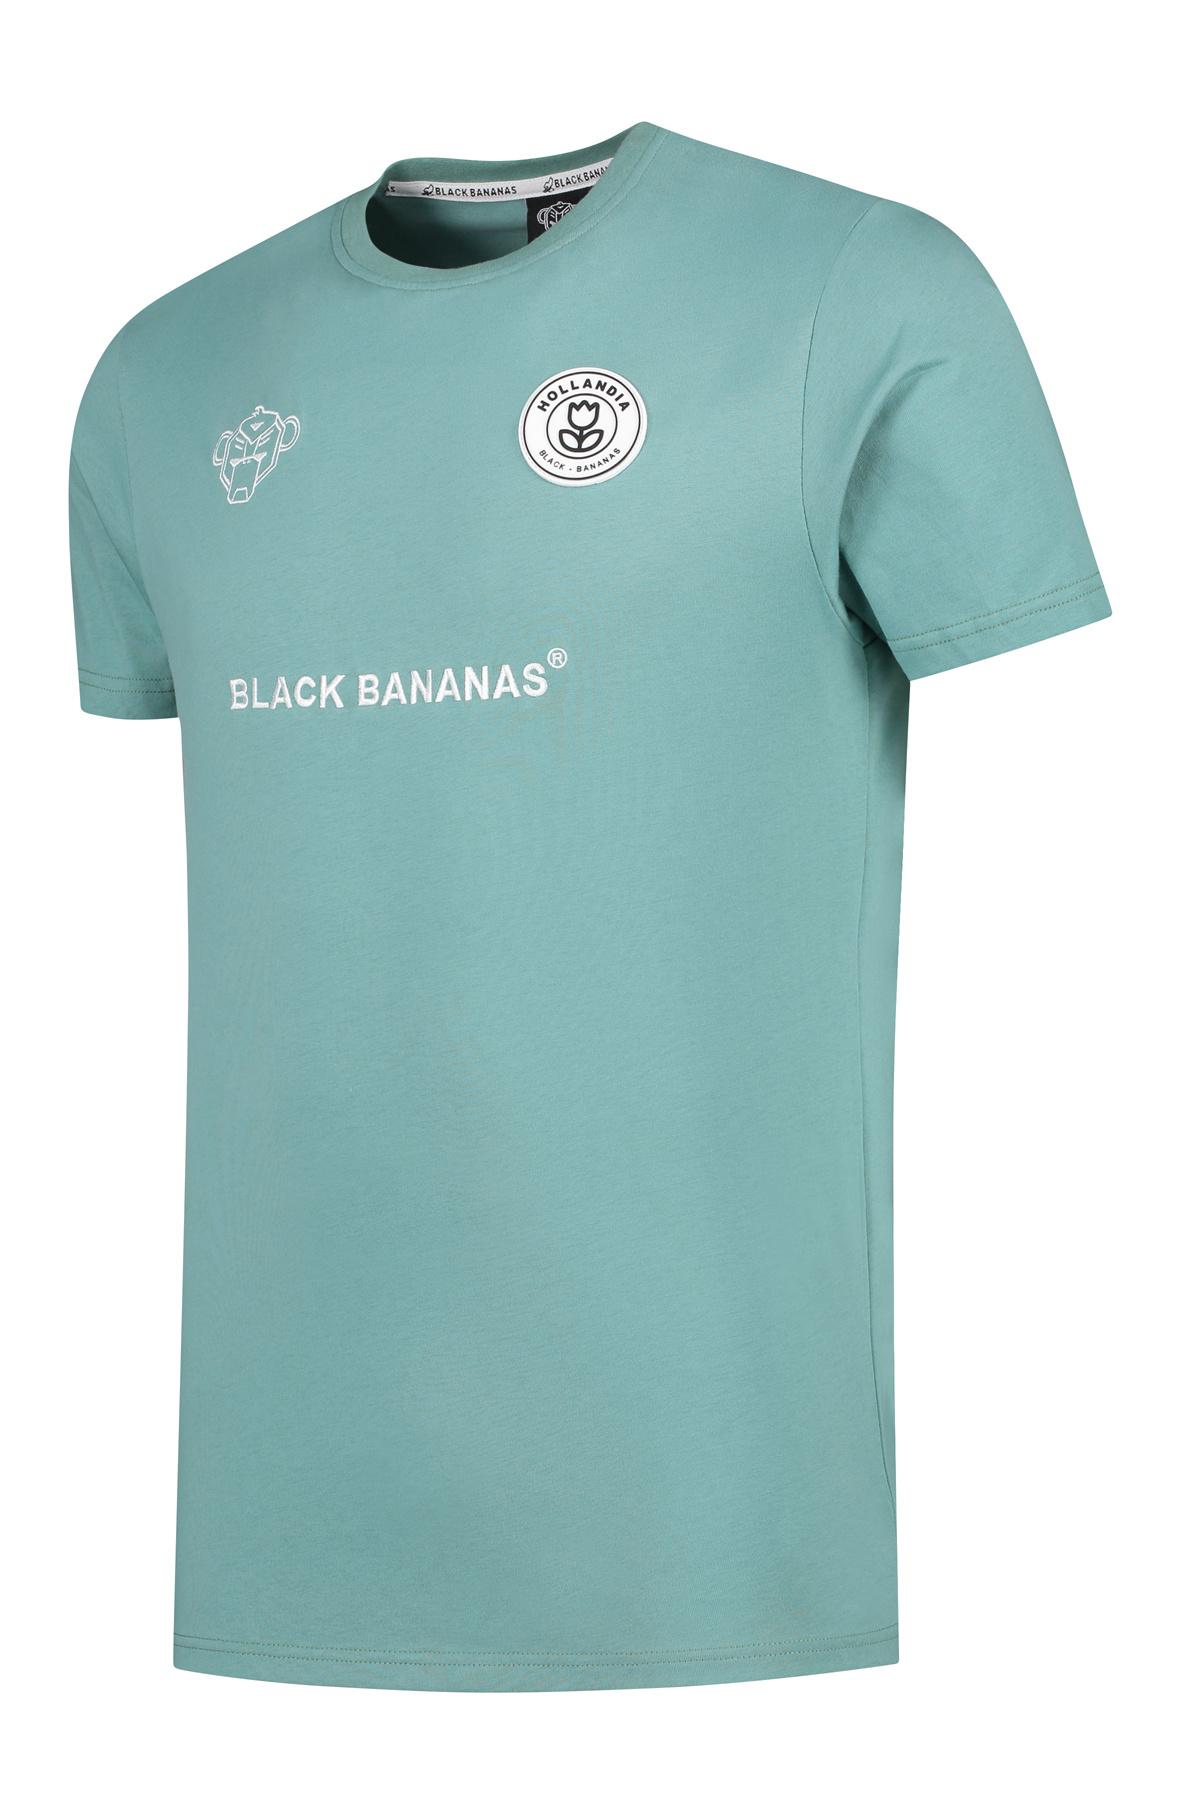 Black Bananas BLCK F.C. basic tee mint green